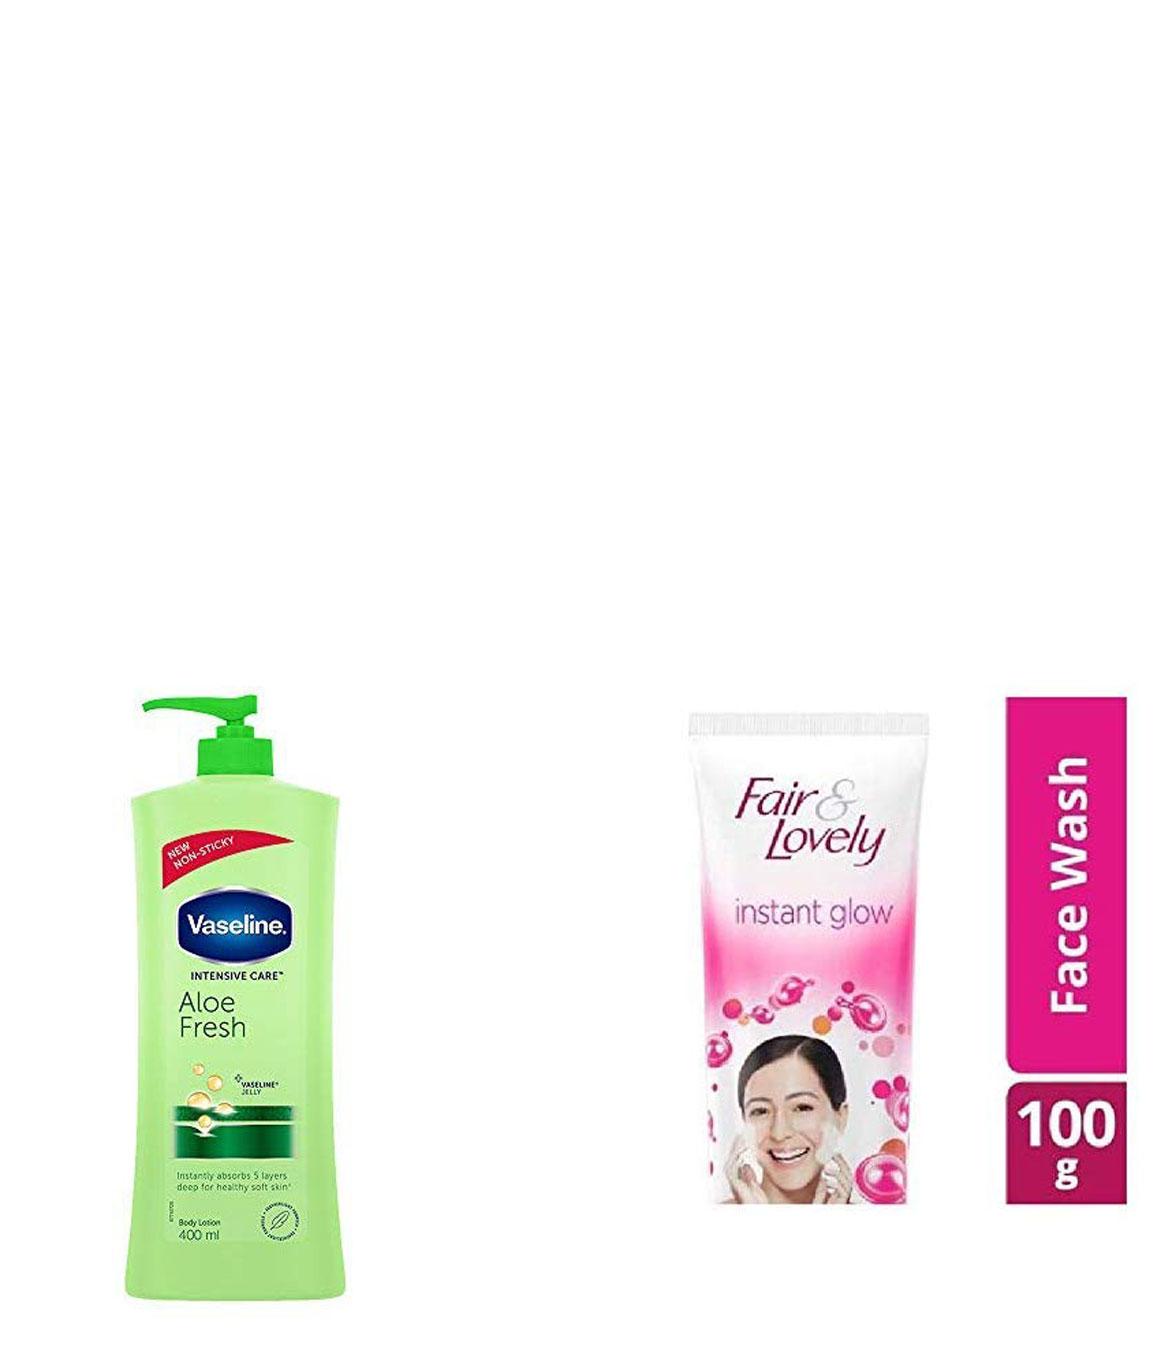 Vaseline Intensive Care Aloe Fresh Body Lotion, 400 ml & Fair & Lovely Fairness Face Wash, 100gm